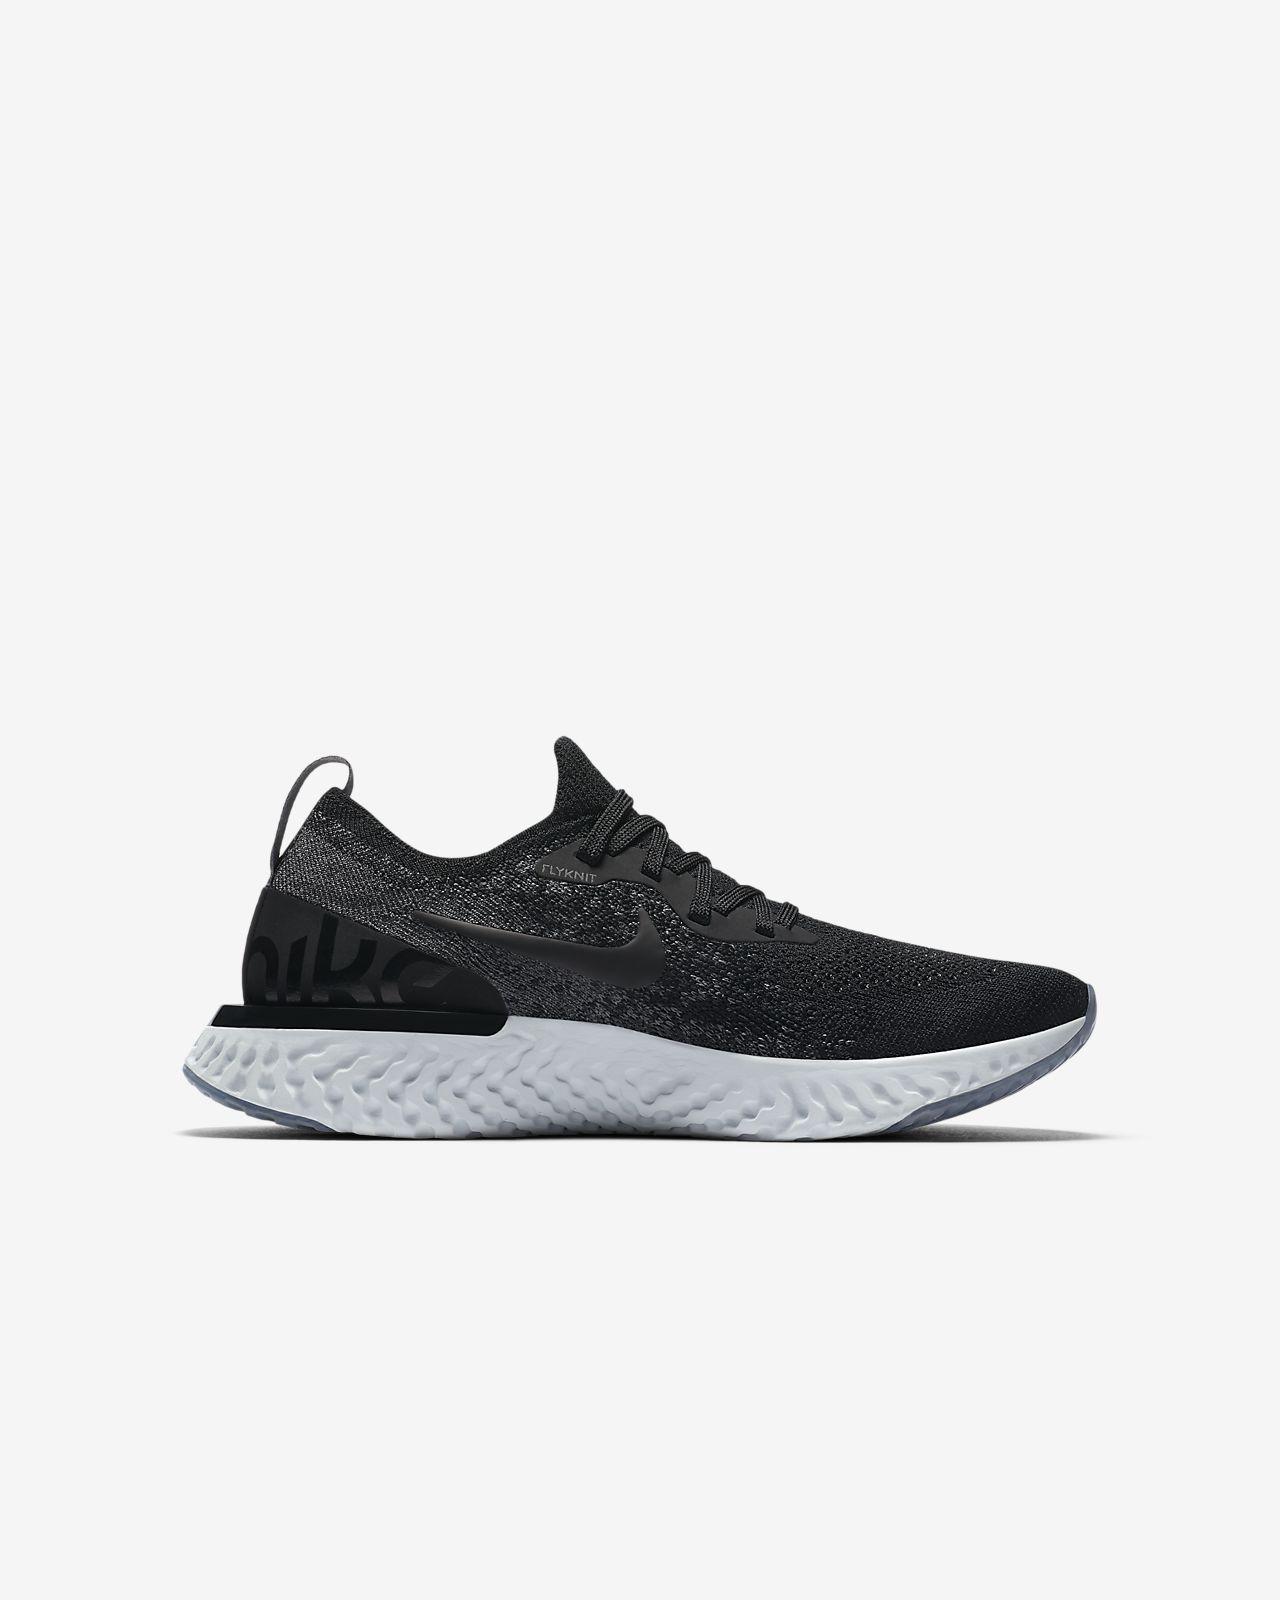 Zapatos grises Nike Racer infantiles talla 38 Q4WgT